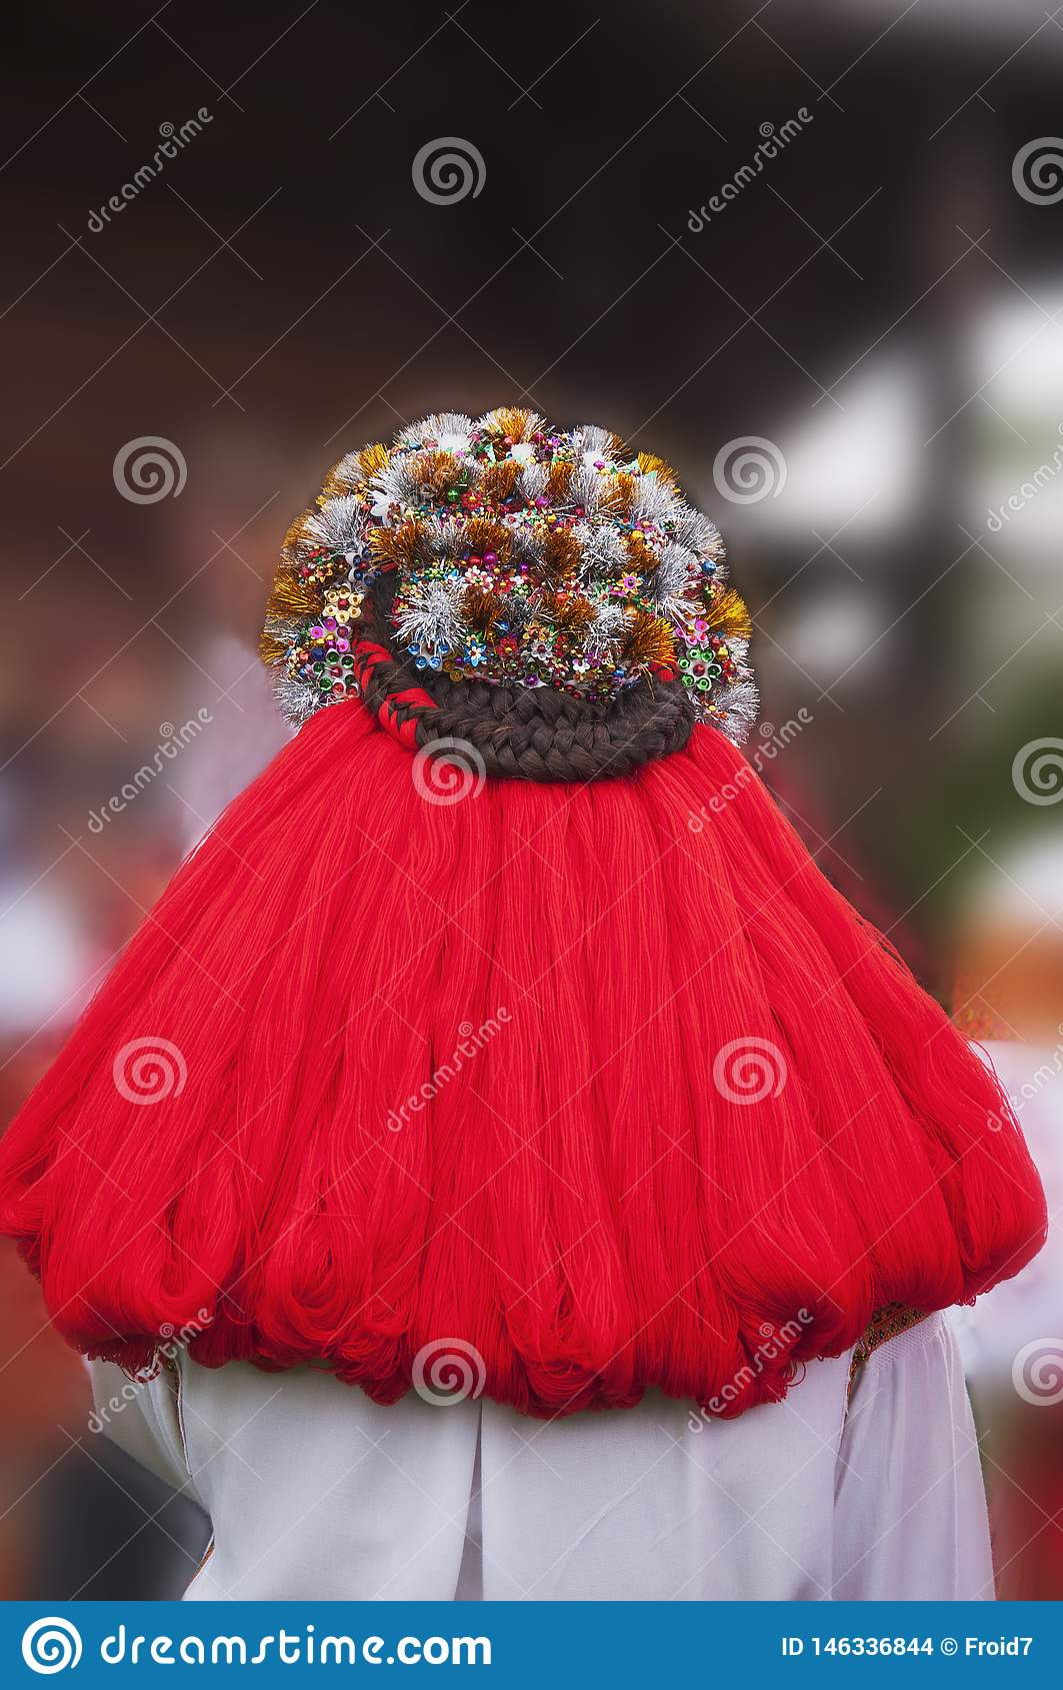 Ethnic headdress. Wedding wreath. Traditions of the mountain region